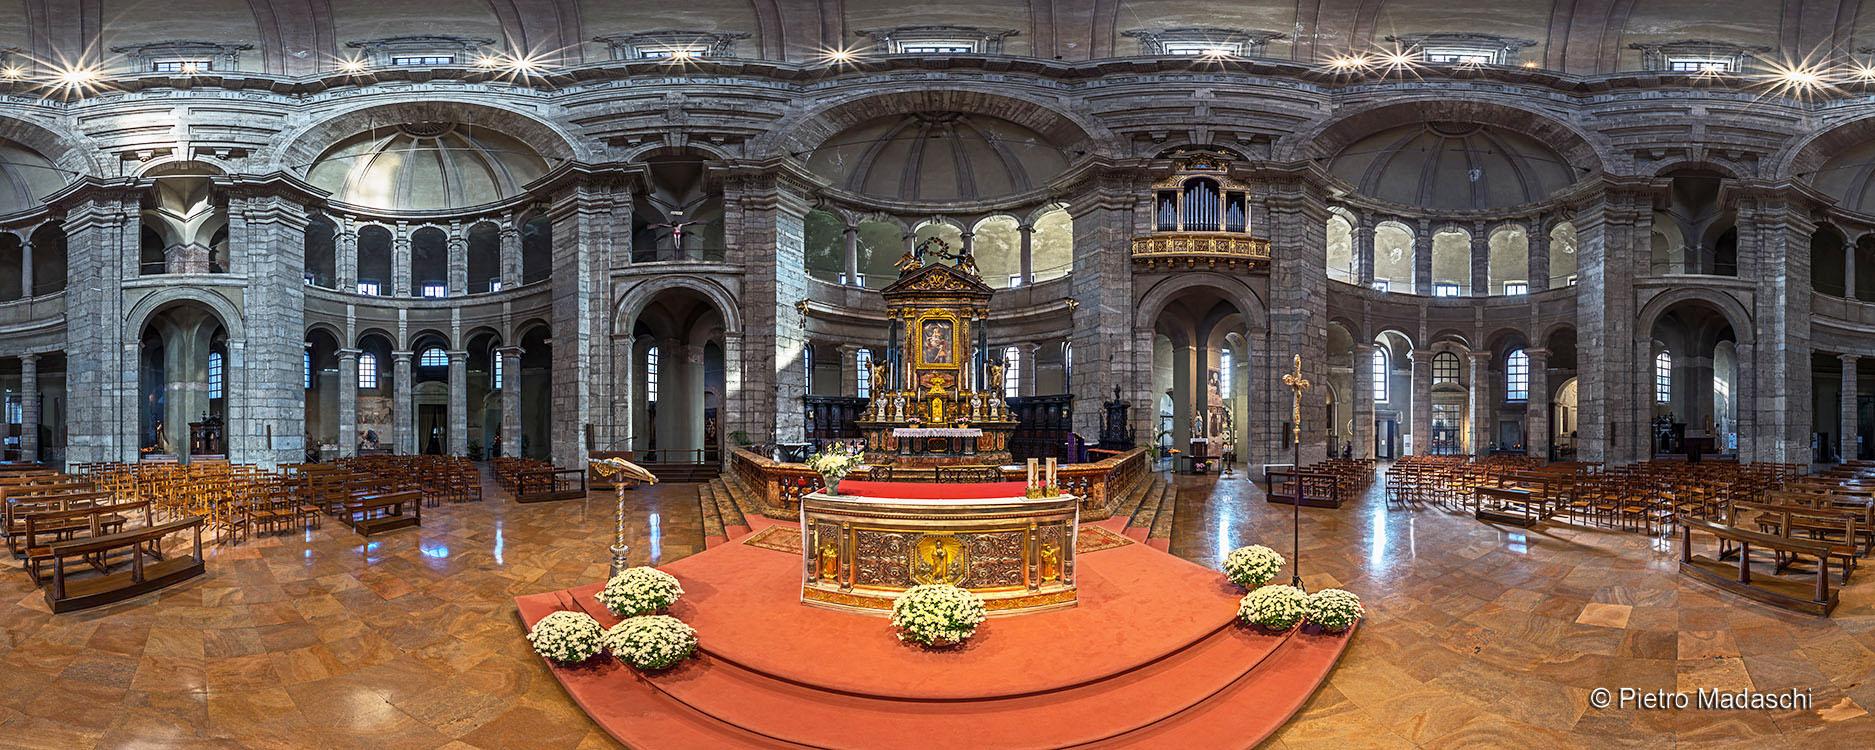 The ancient Basilica of St Lorenzo Maggiore: the interior in Octagonal Shape